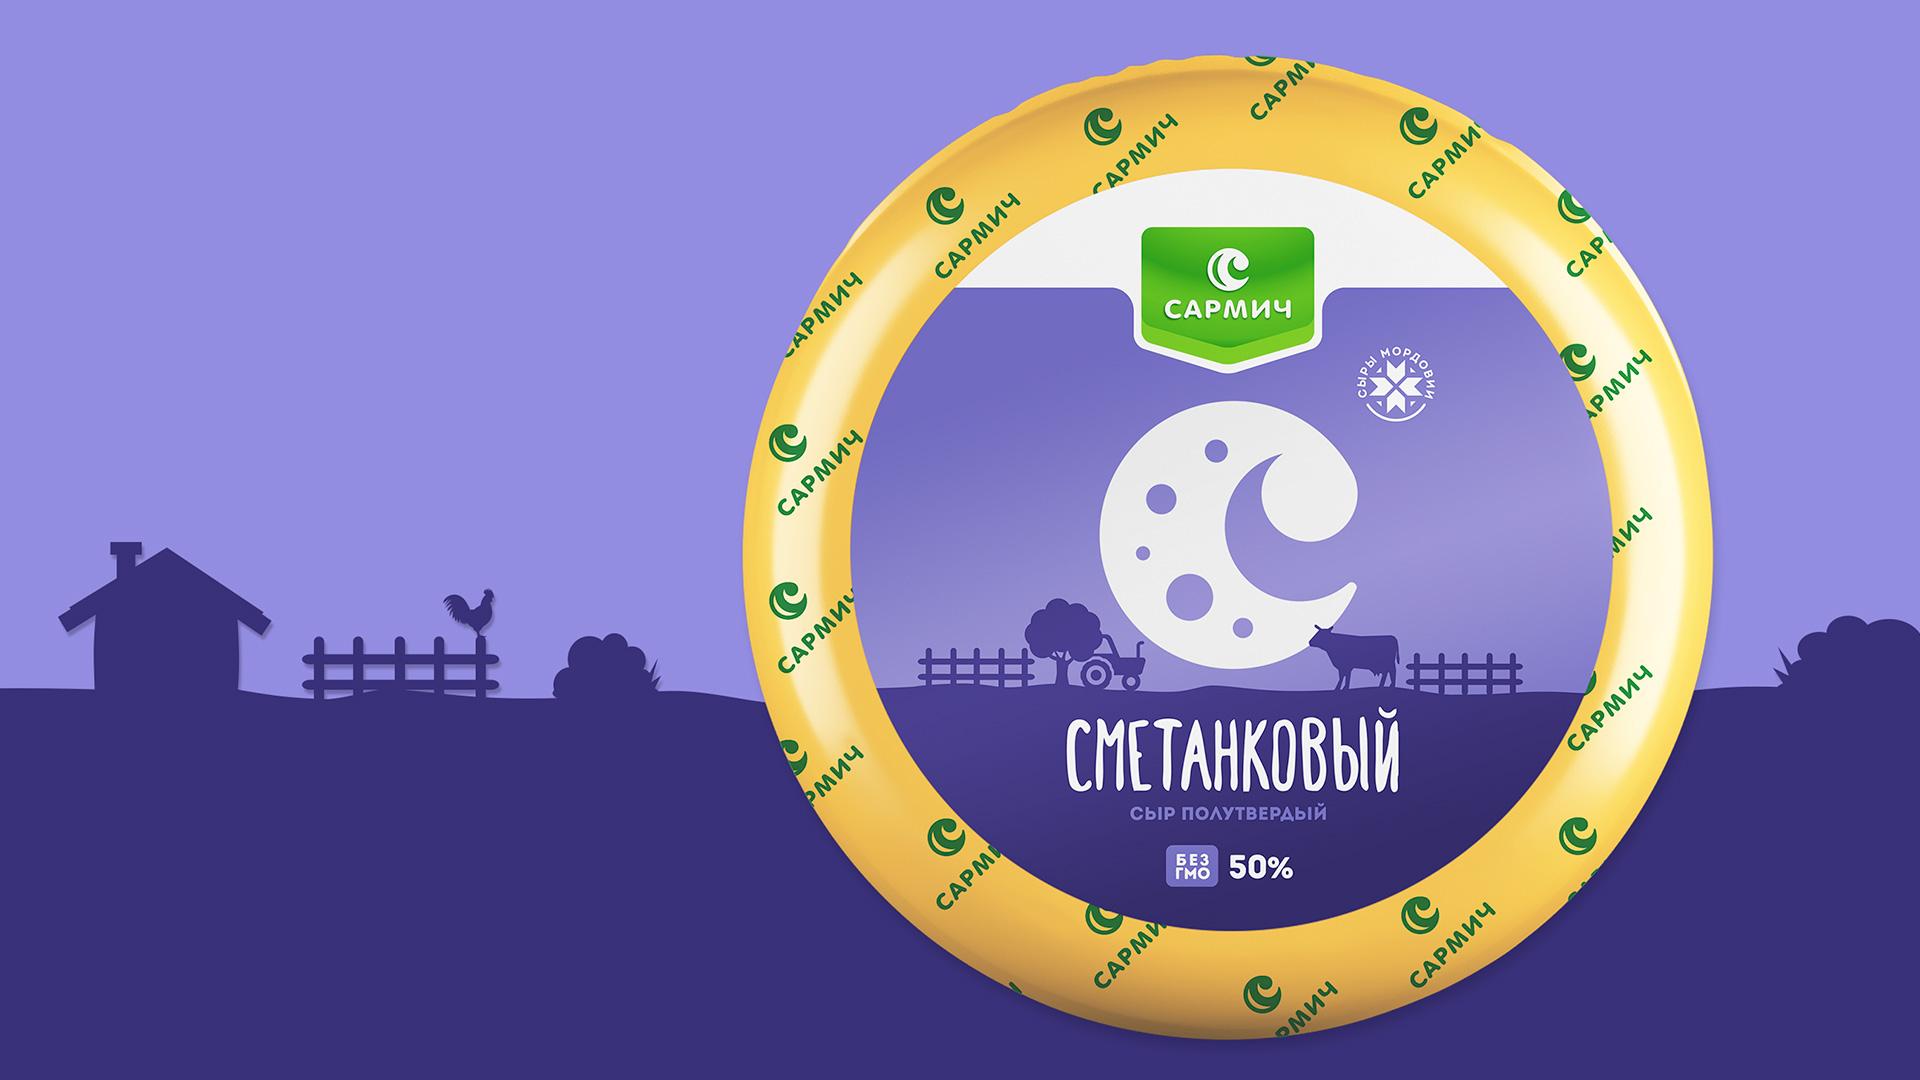 Asgard, naming, package design, graphic design, Cheese factory, trademark, logo, сметанковый сыр Сармич, шеврон